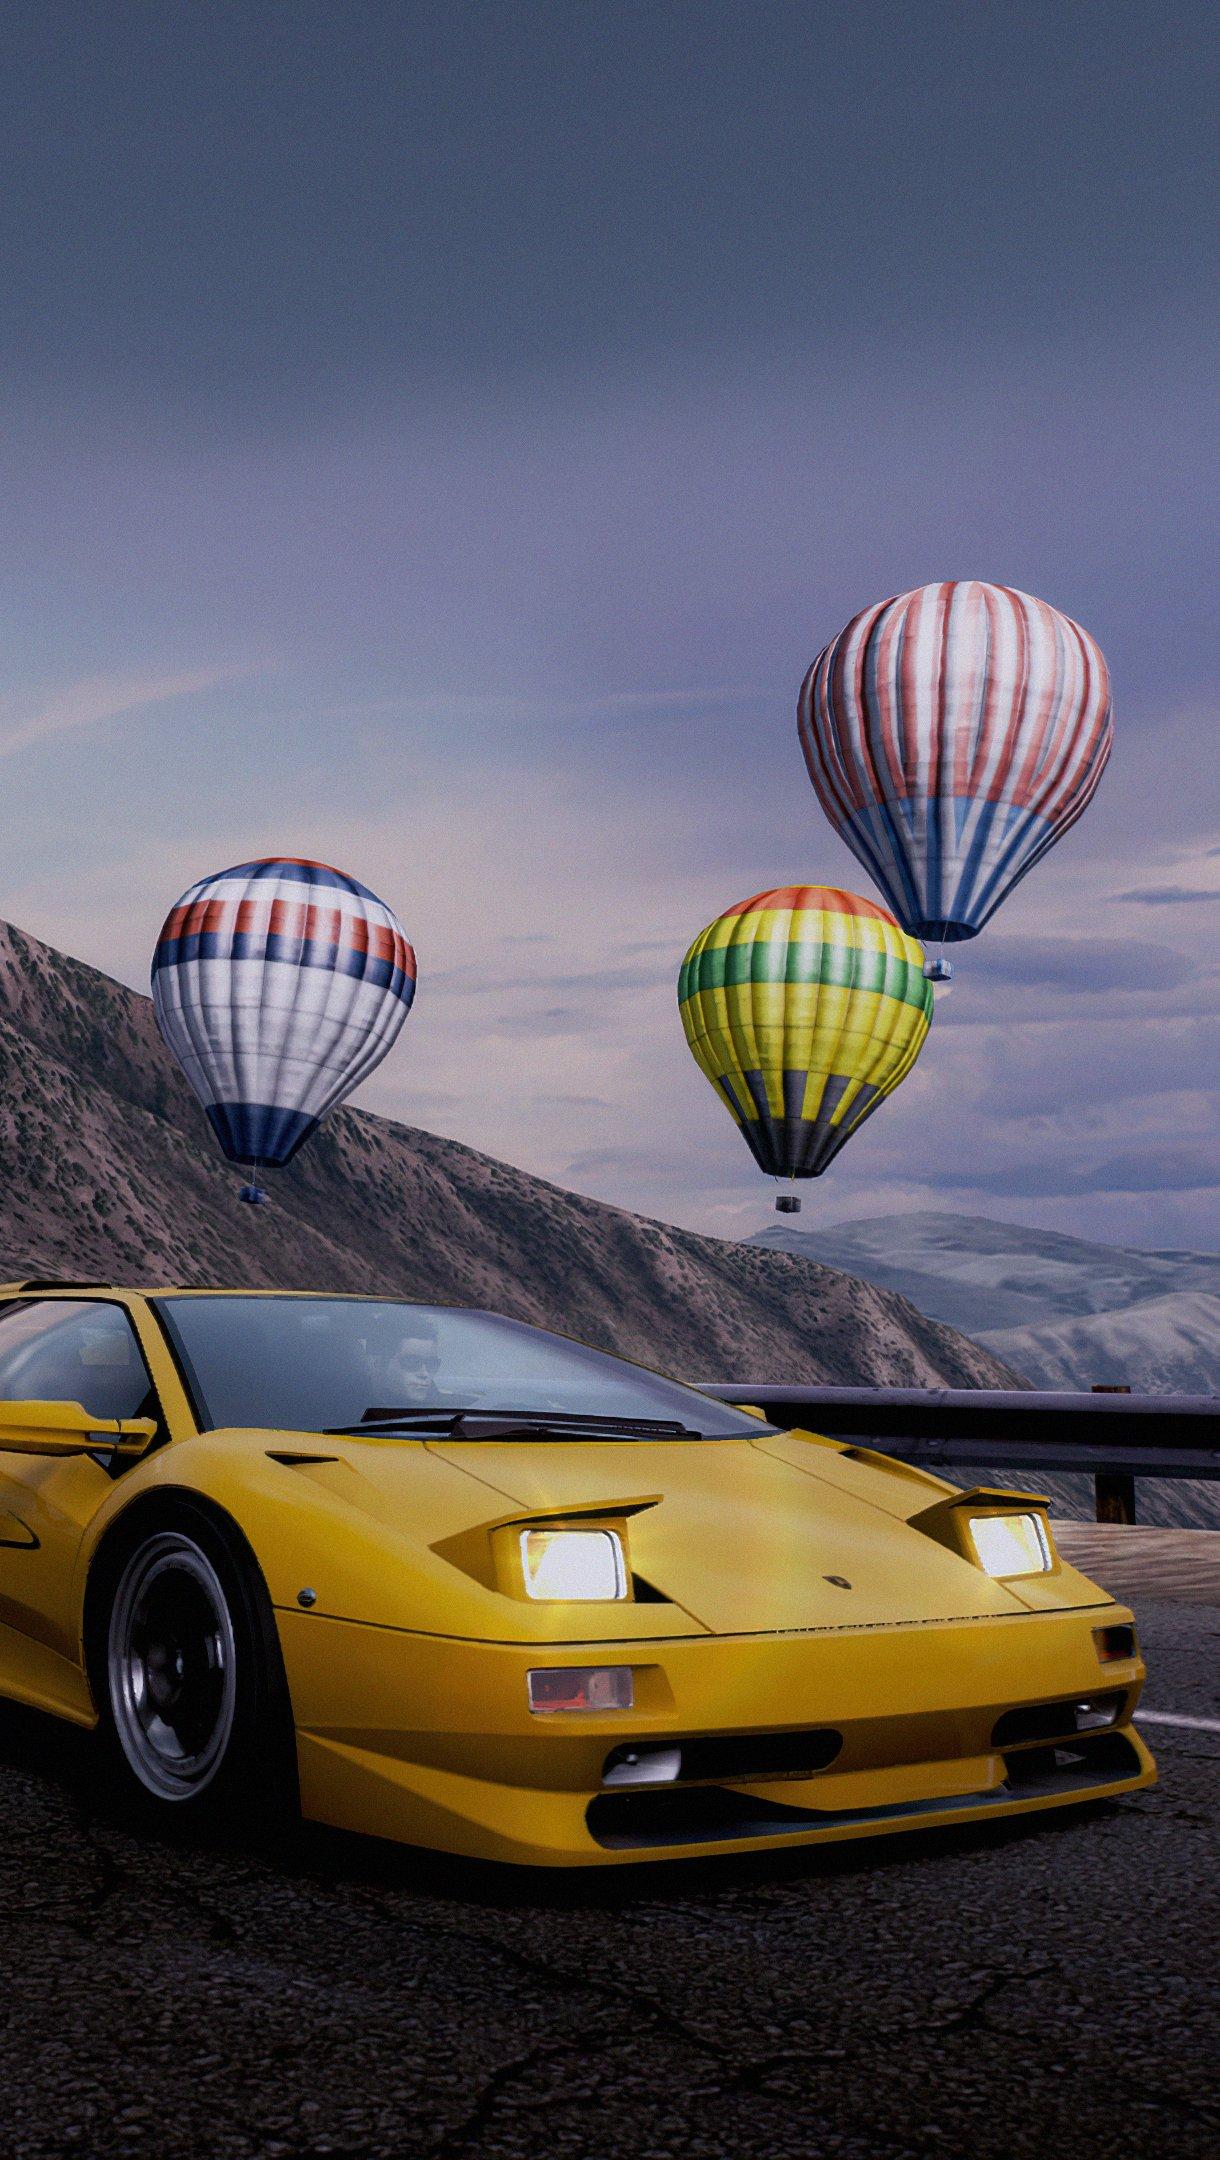 Fondos de pantalla Need for Speed Hot pursuit Lamborghini Diablo Vertical